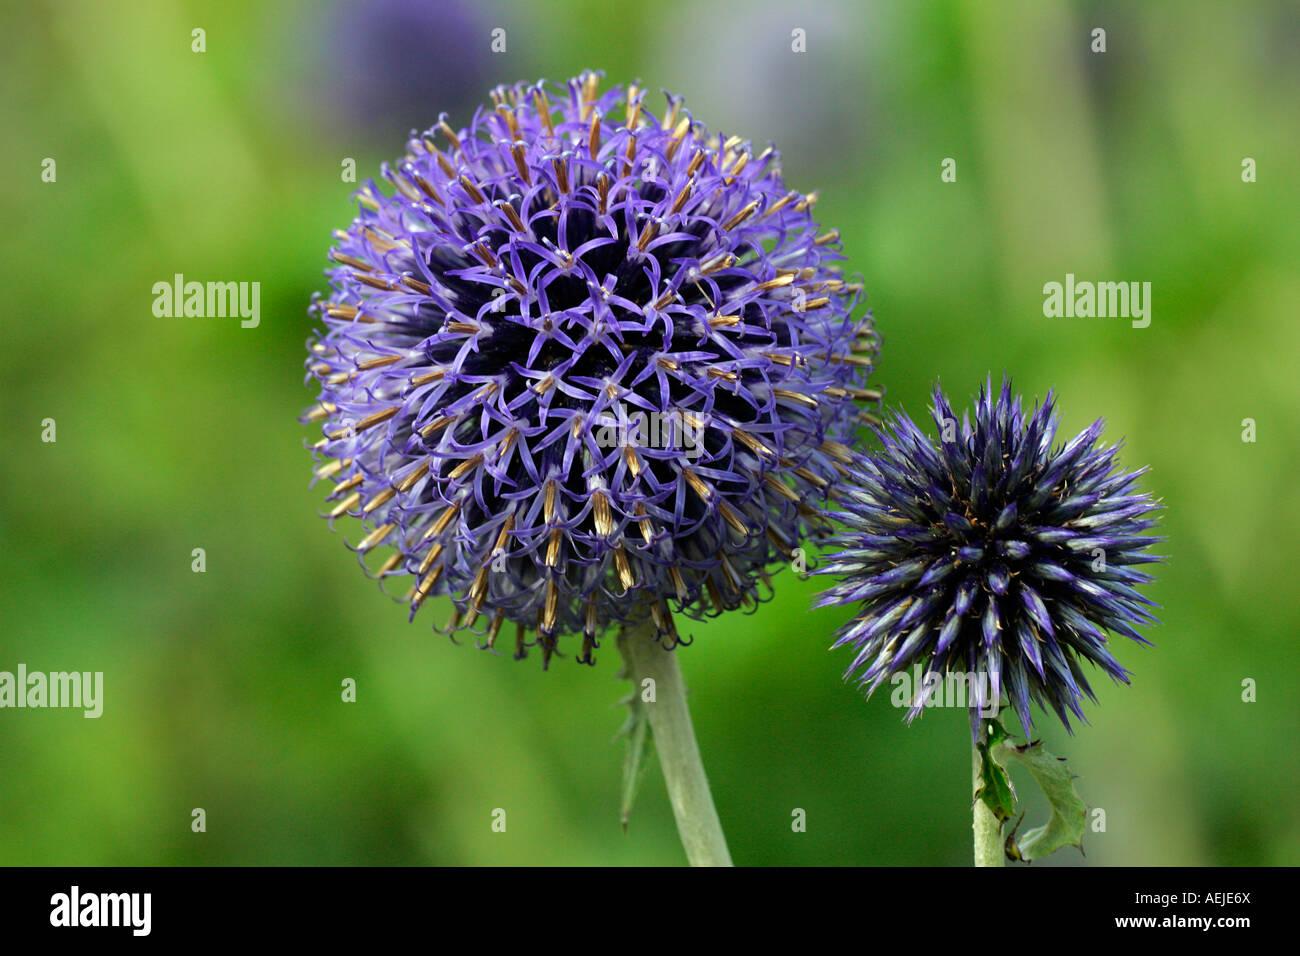 Flowering Blue Globe Thistle (Echinops bannaticus Taplow Blue) - Stock Image